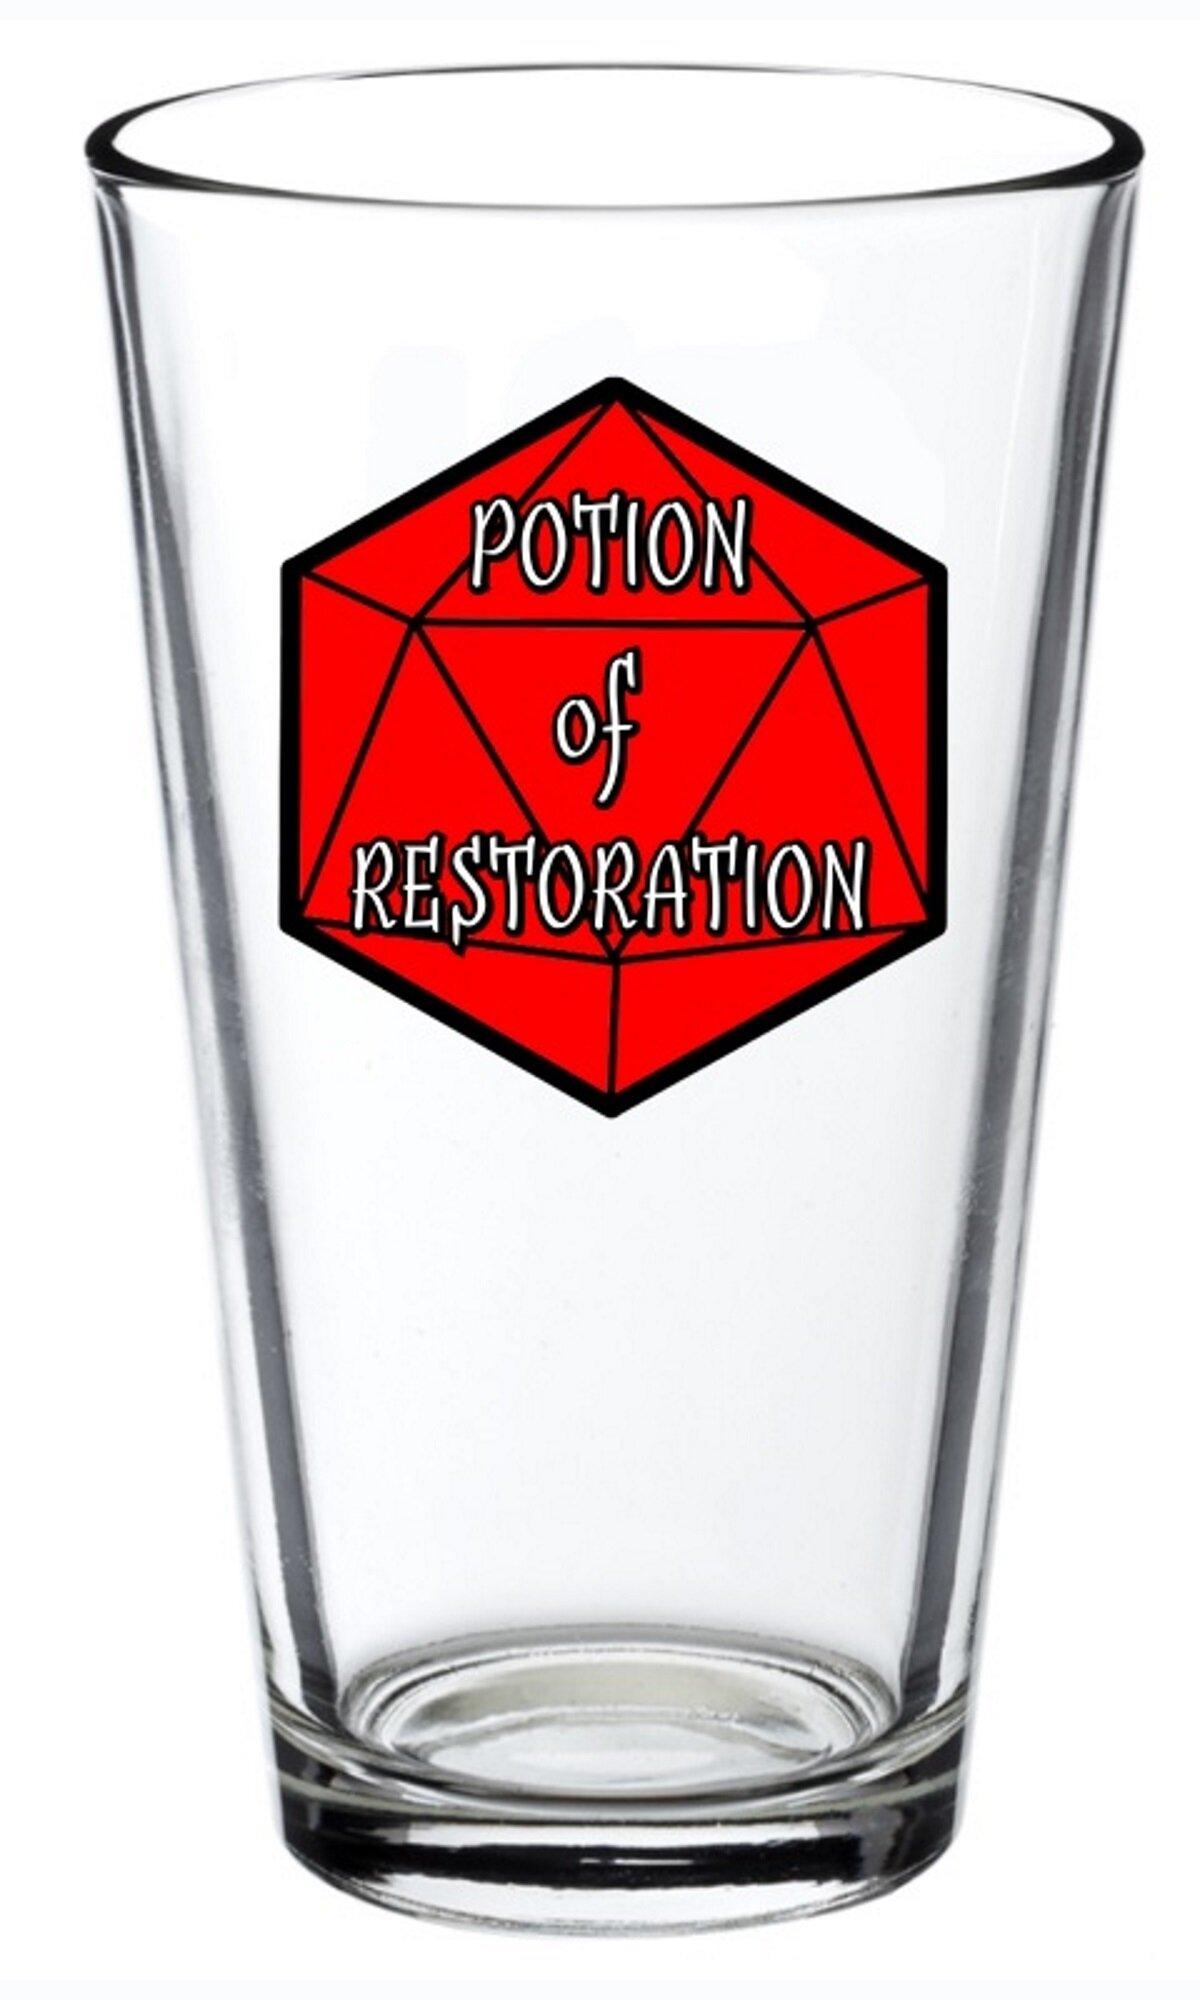 Potion of Restoration